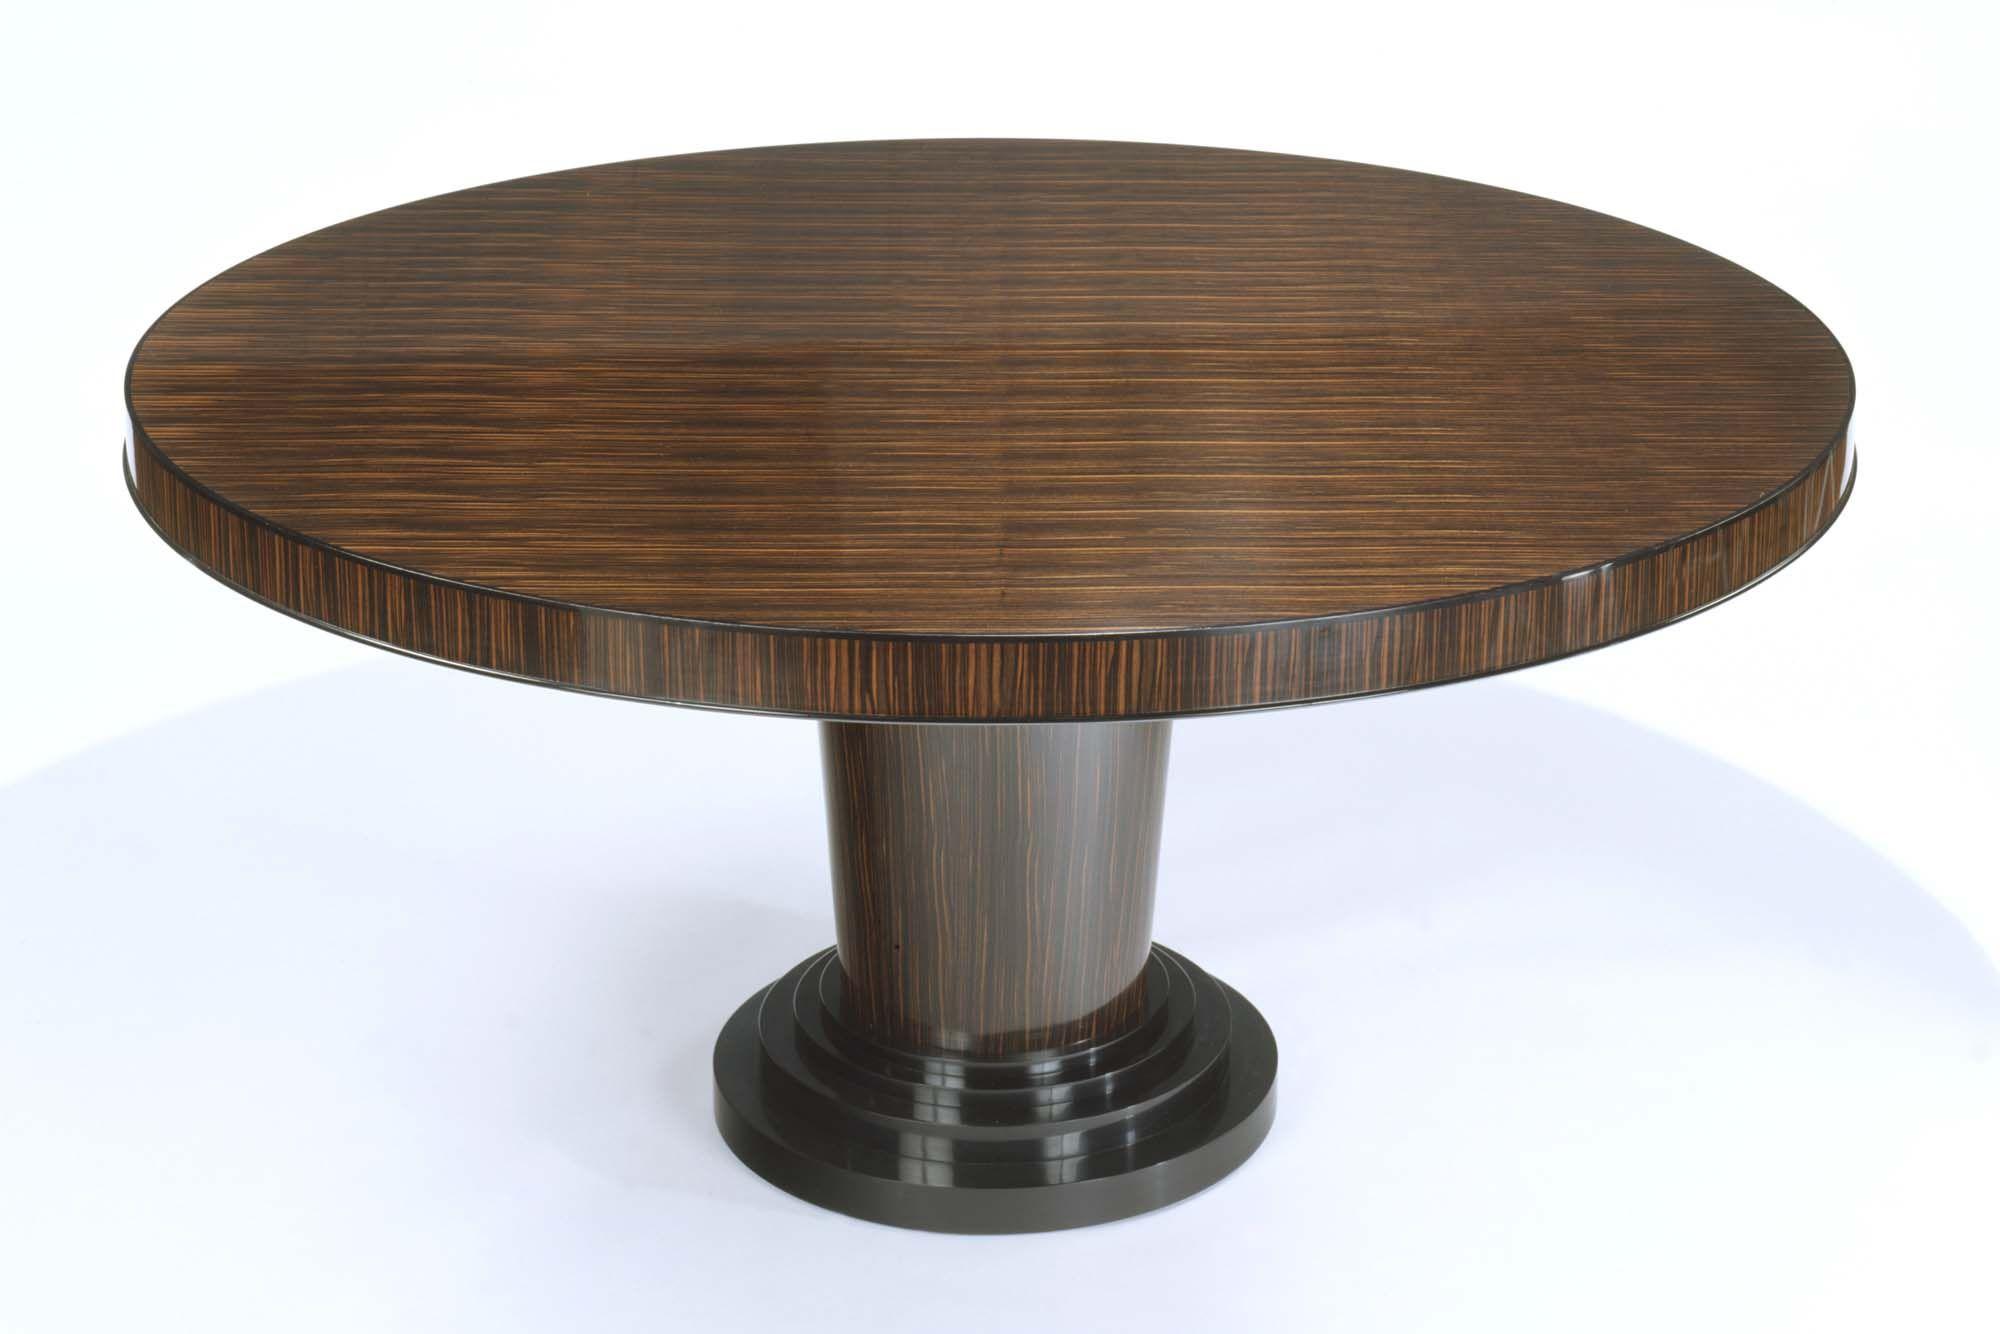 DAVIDSON London - The Fezer Table in Massacar Ebony